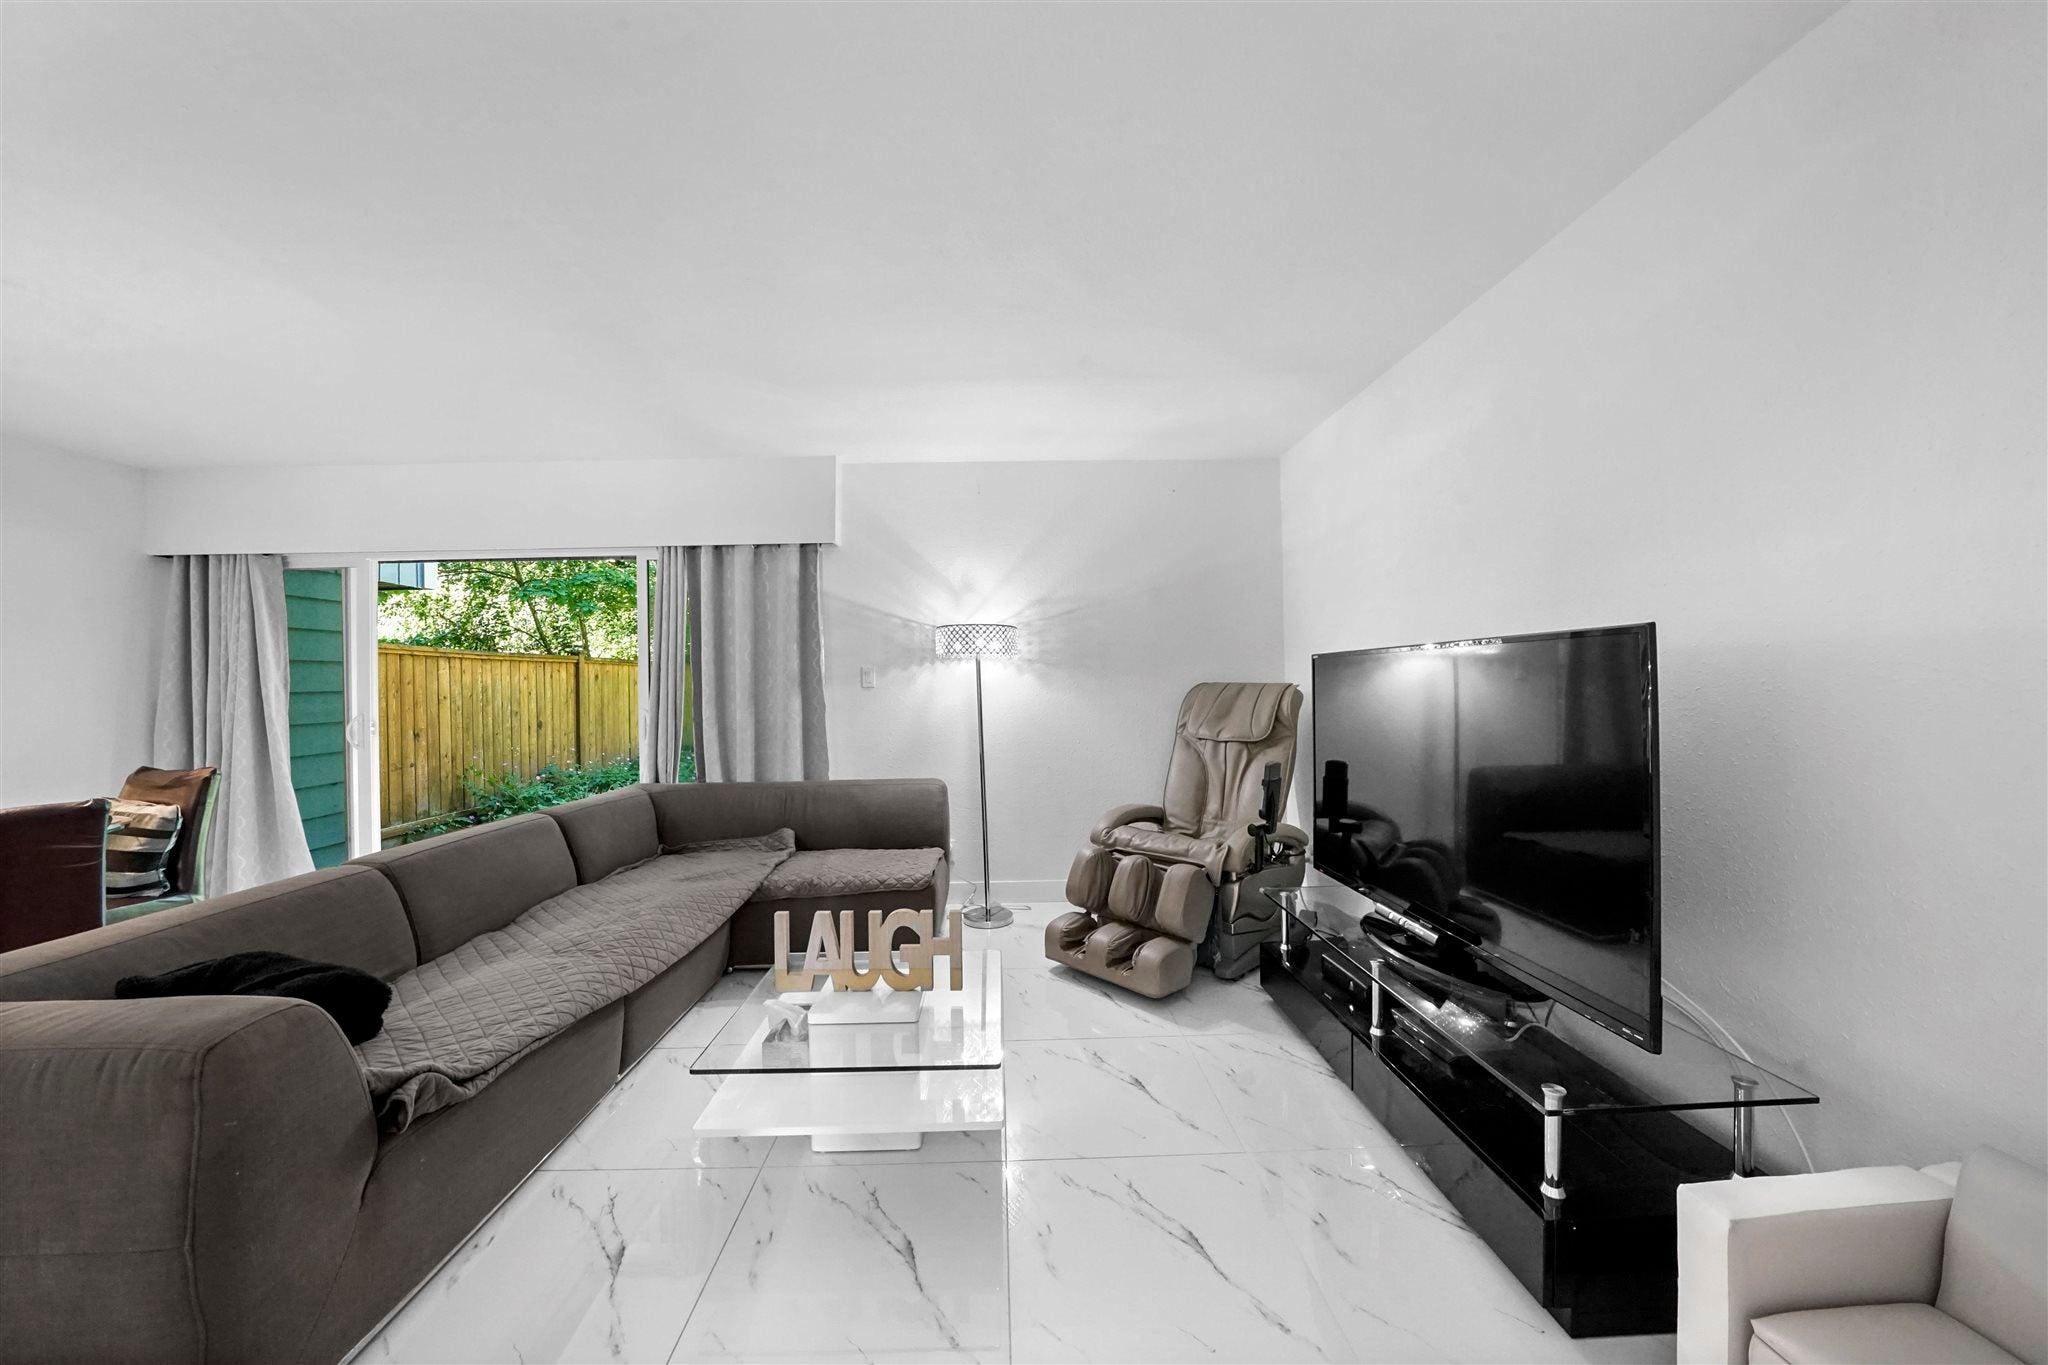 9191 GLENDOWER DRIVE - Saunders 1/2 Duplex for sale, 5 Bedrooms (R2595658)